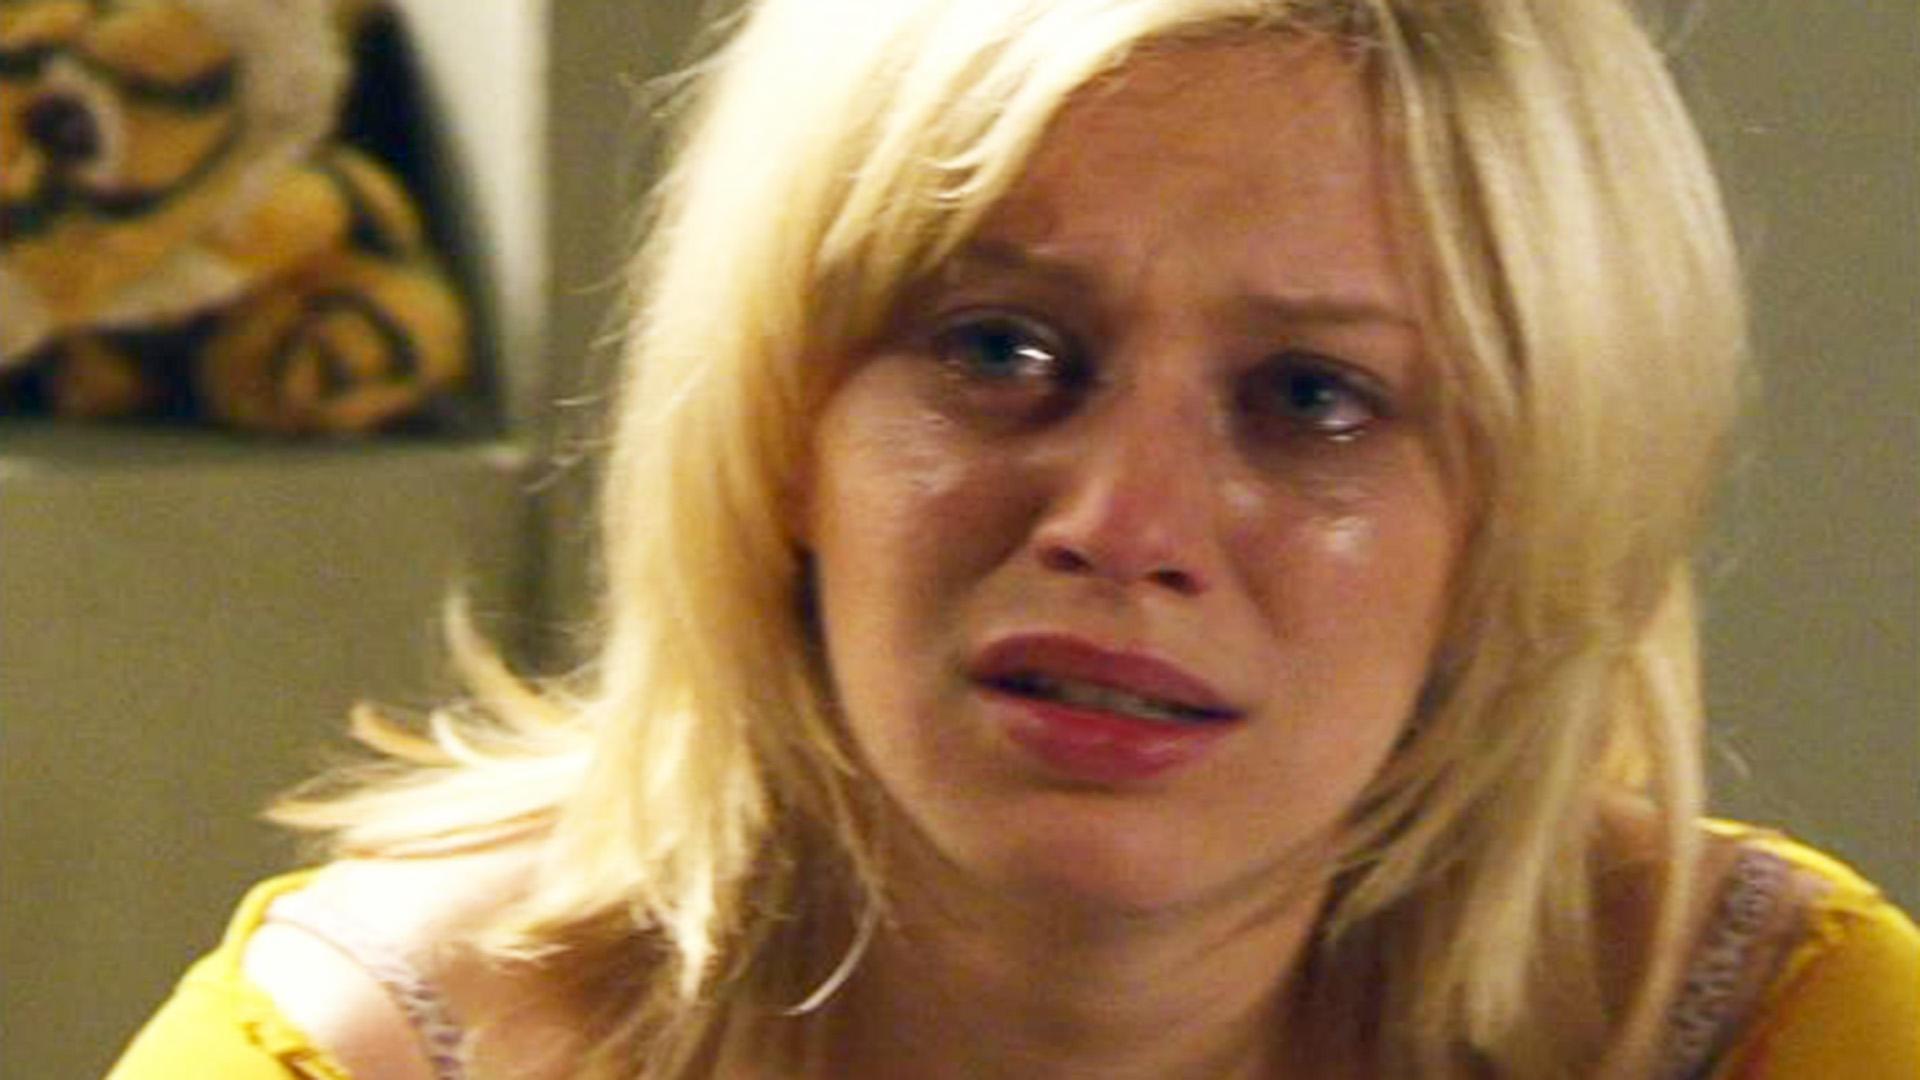 Annette lässt Lena ihre Verachtung spüren | Folge 338